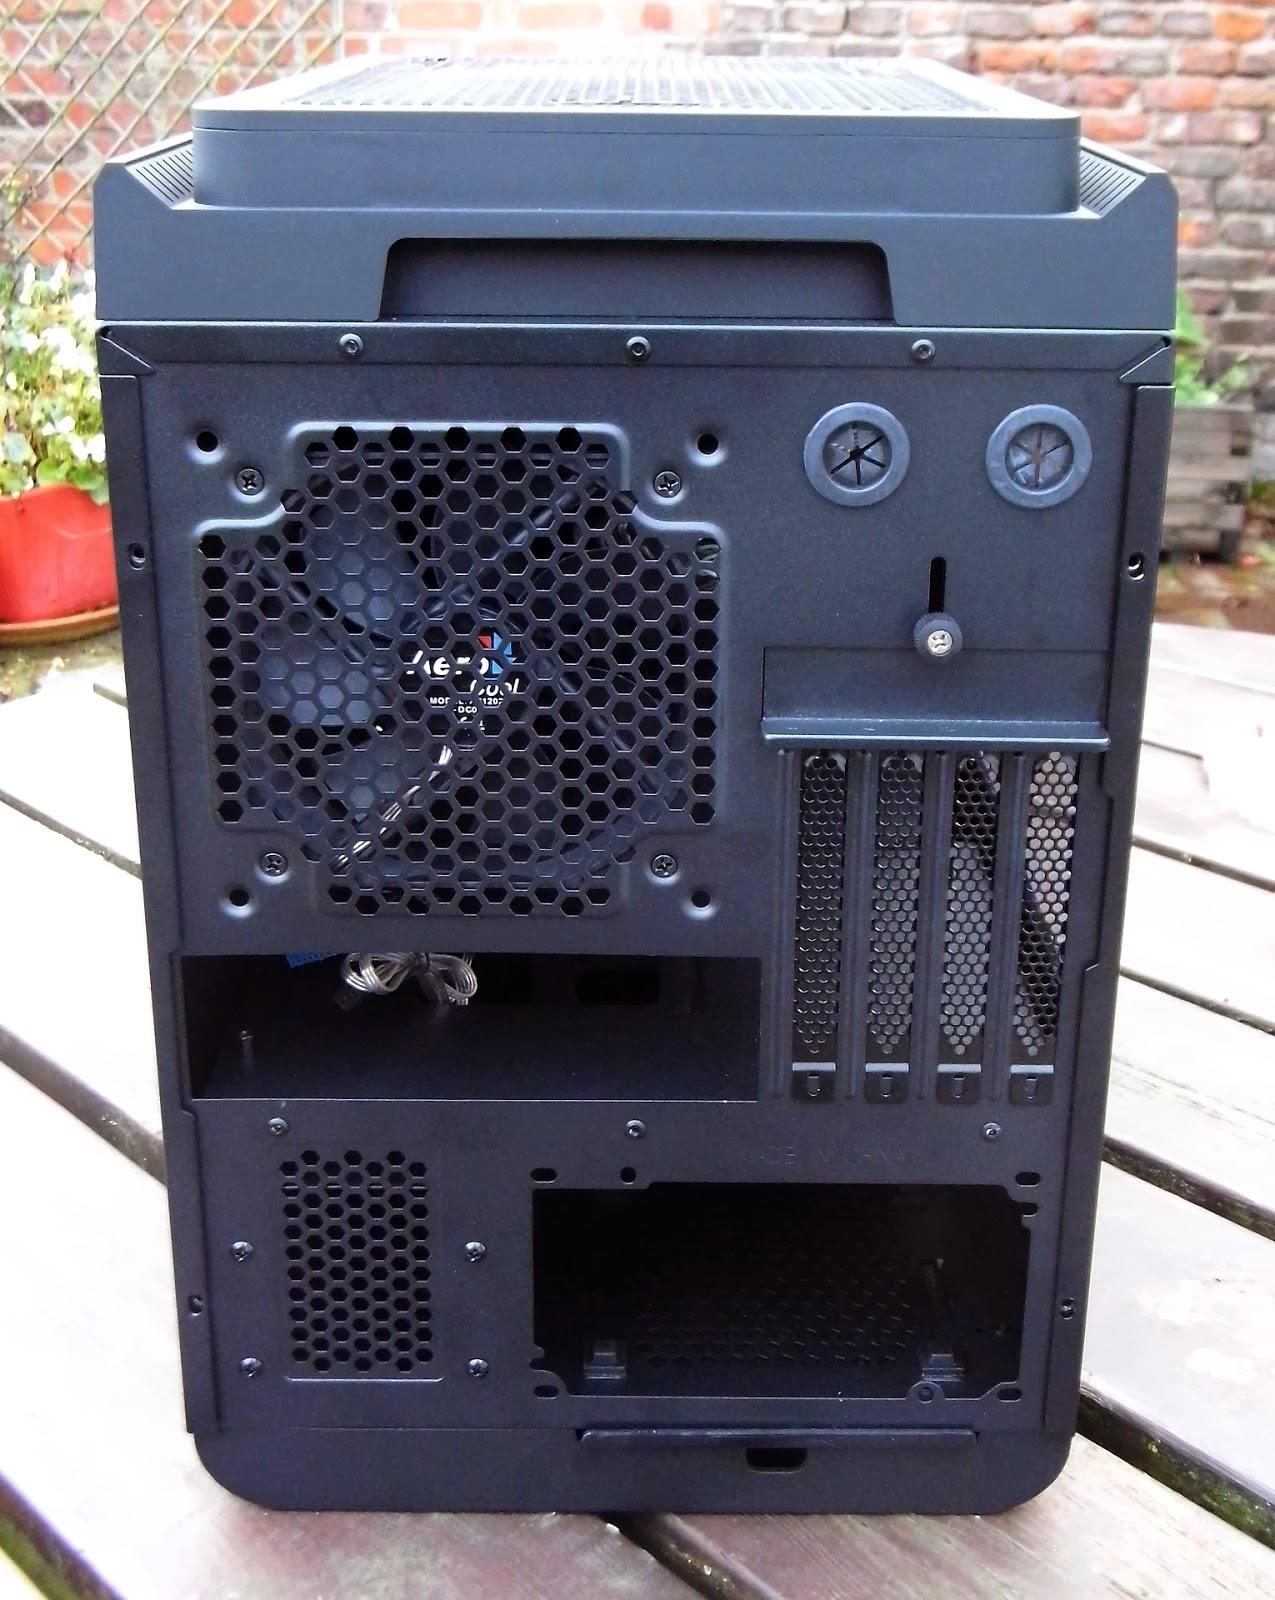 la-centrale-du-hardware-test-boitier-aerocol-ds-dead-silence-cube-dos